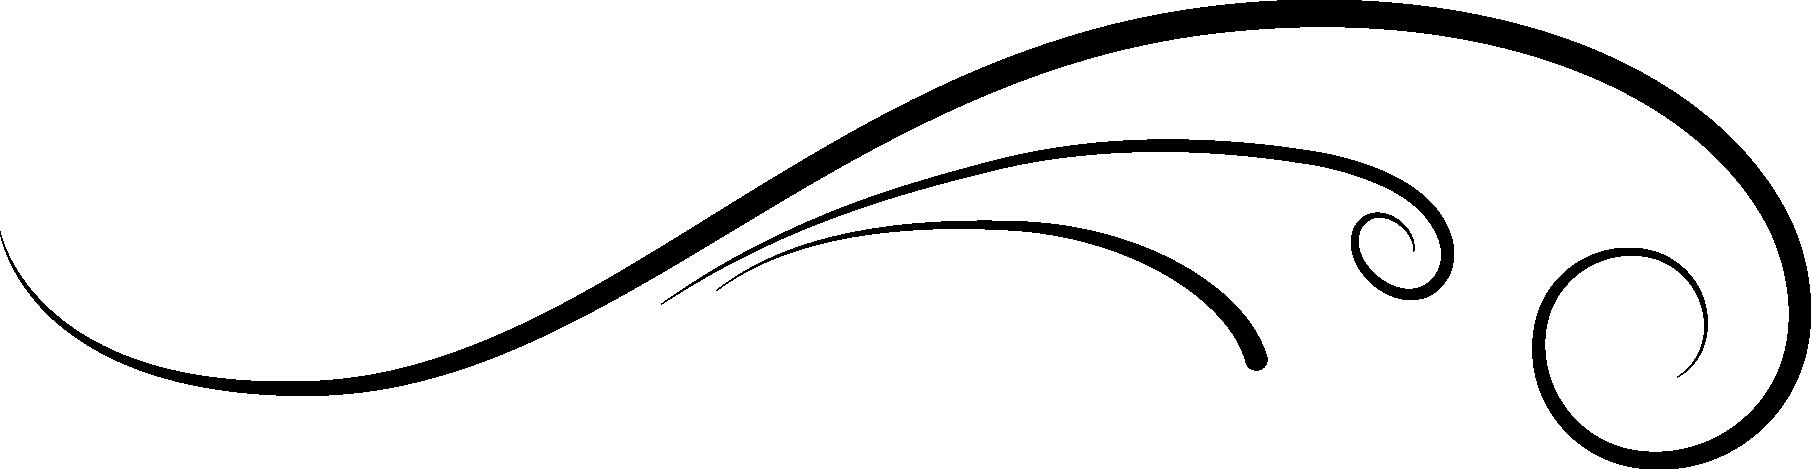 clipart-design-swirl-11-transparent